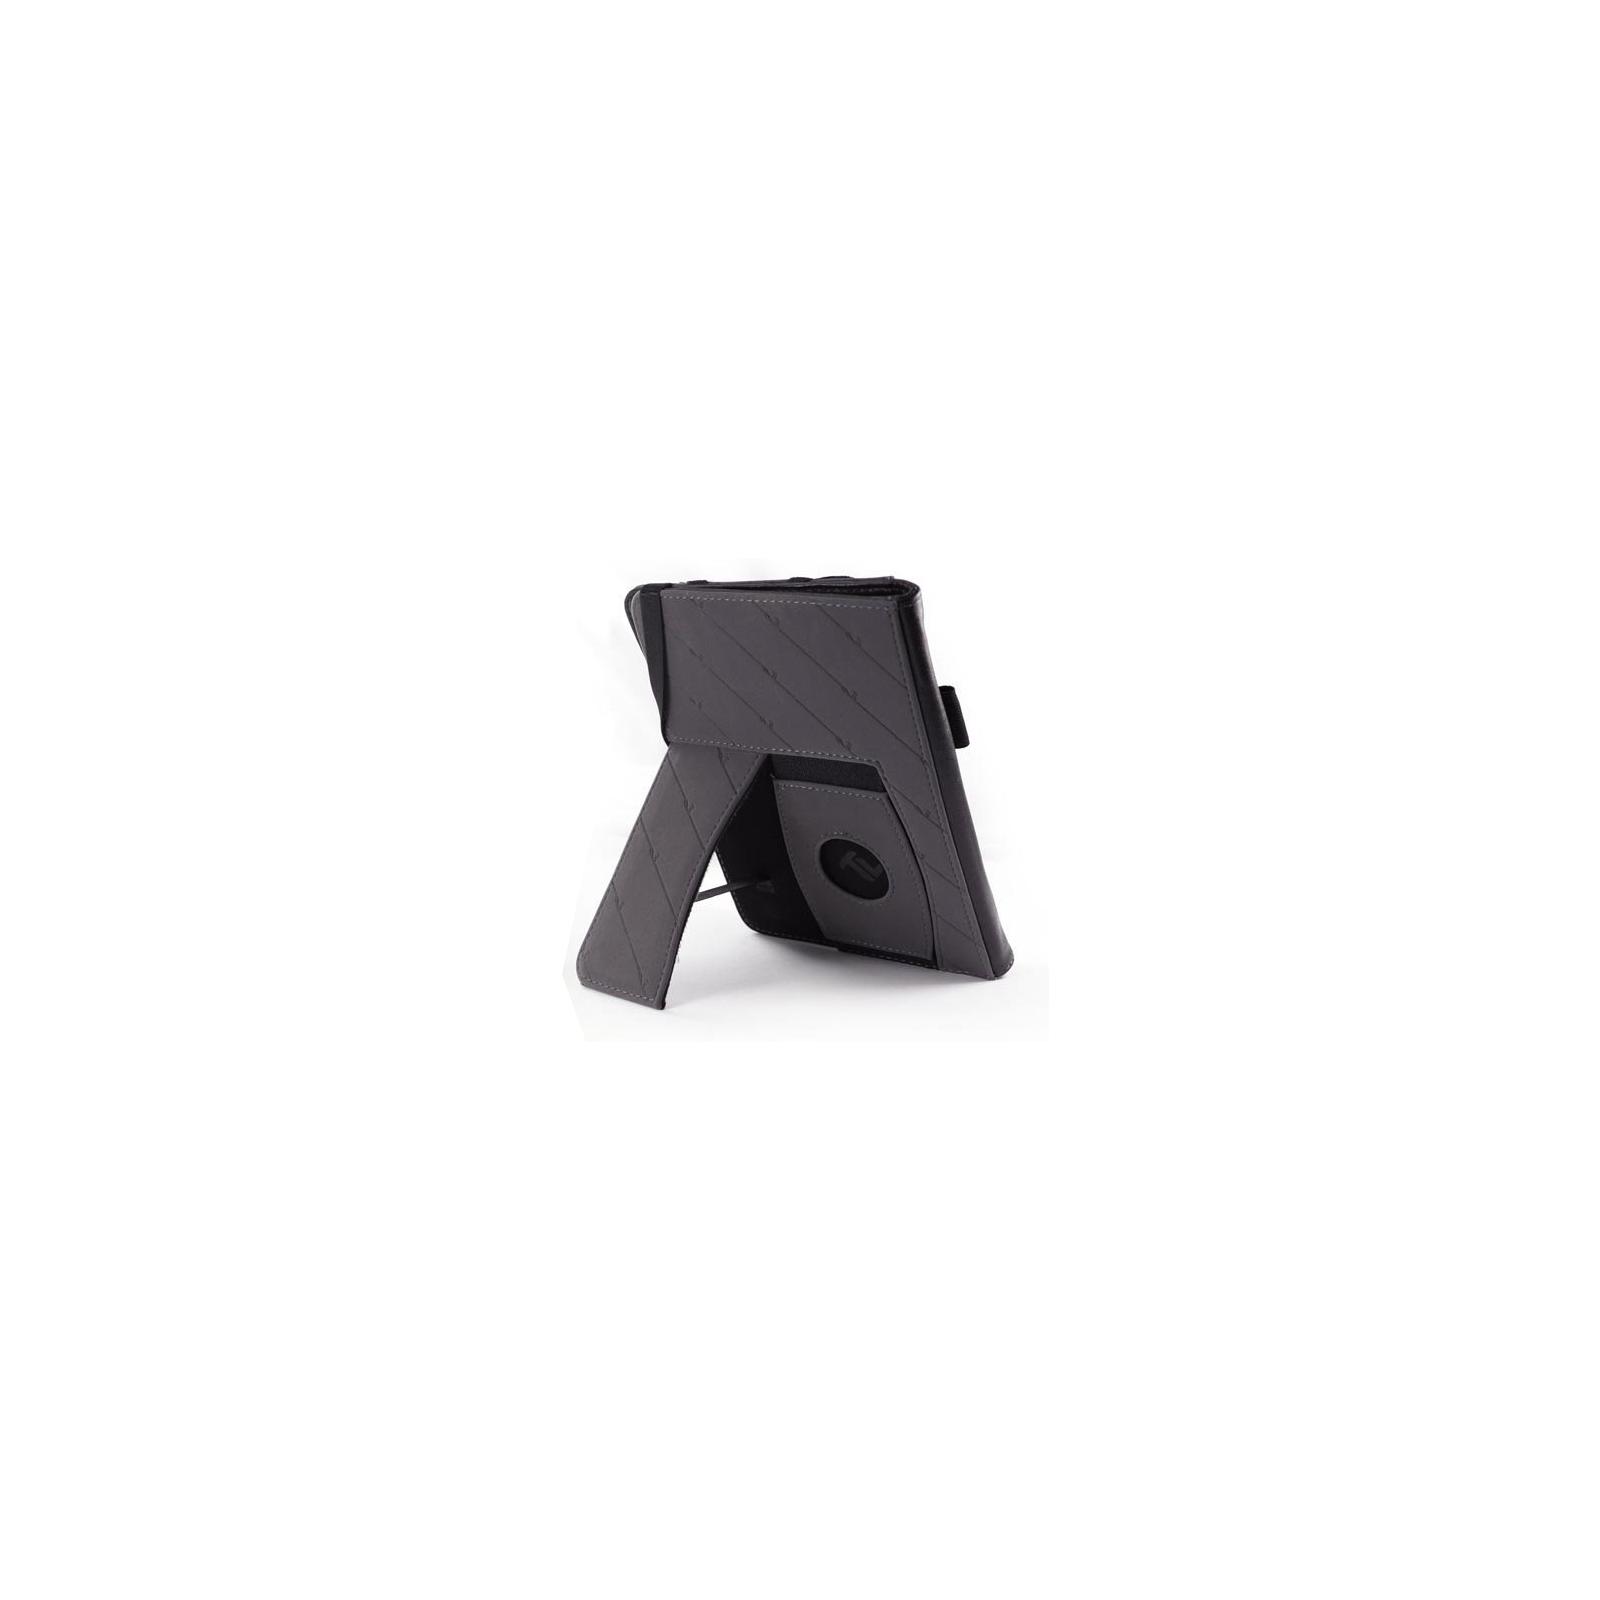 Чехол для электронной книги Tuff-Luv 6 Embrace Plus Leather Napa Black (A10_40) изображение 2